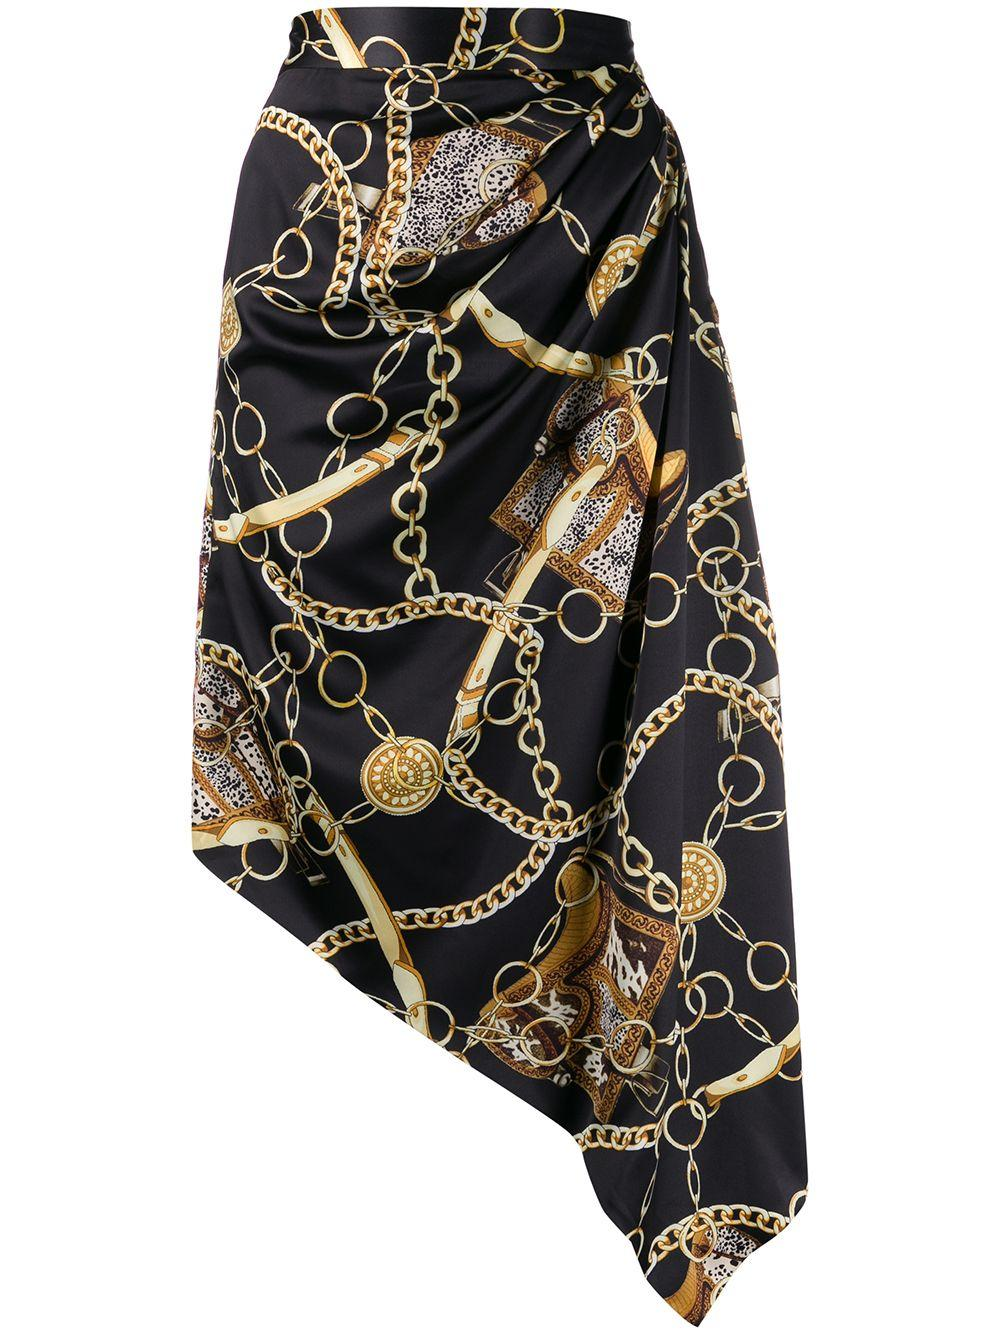 Giuseppe Di Morabito chain print asymmetric skirt